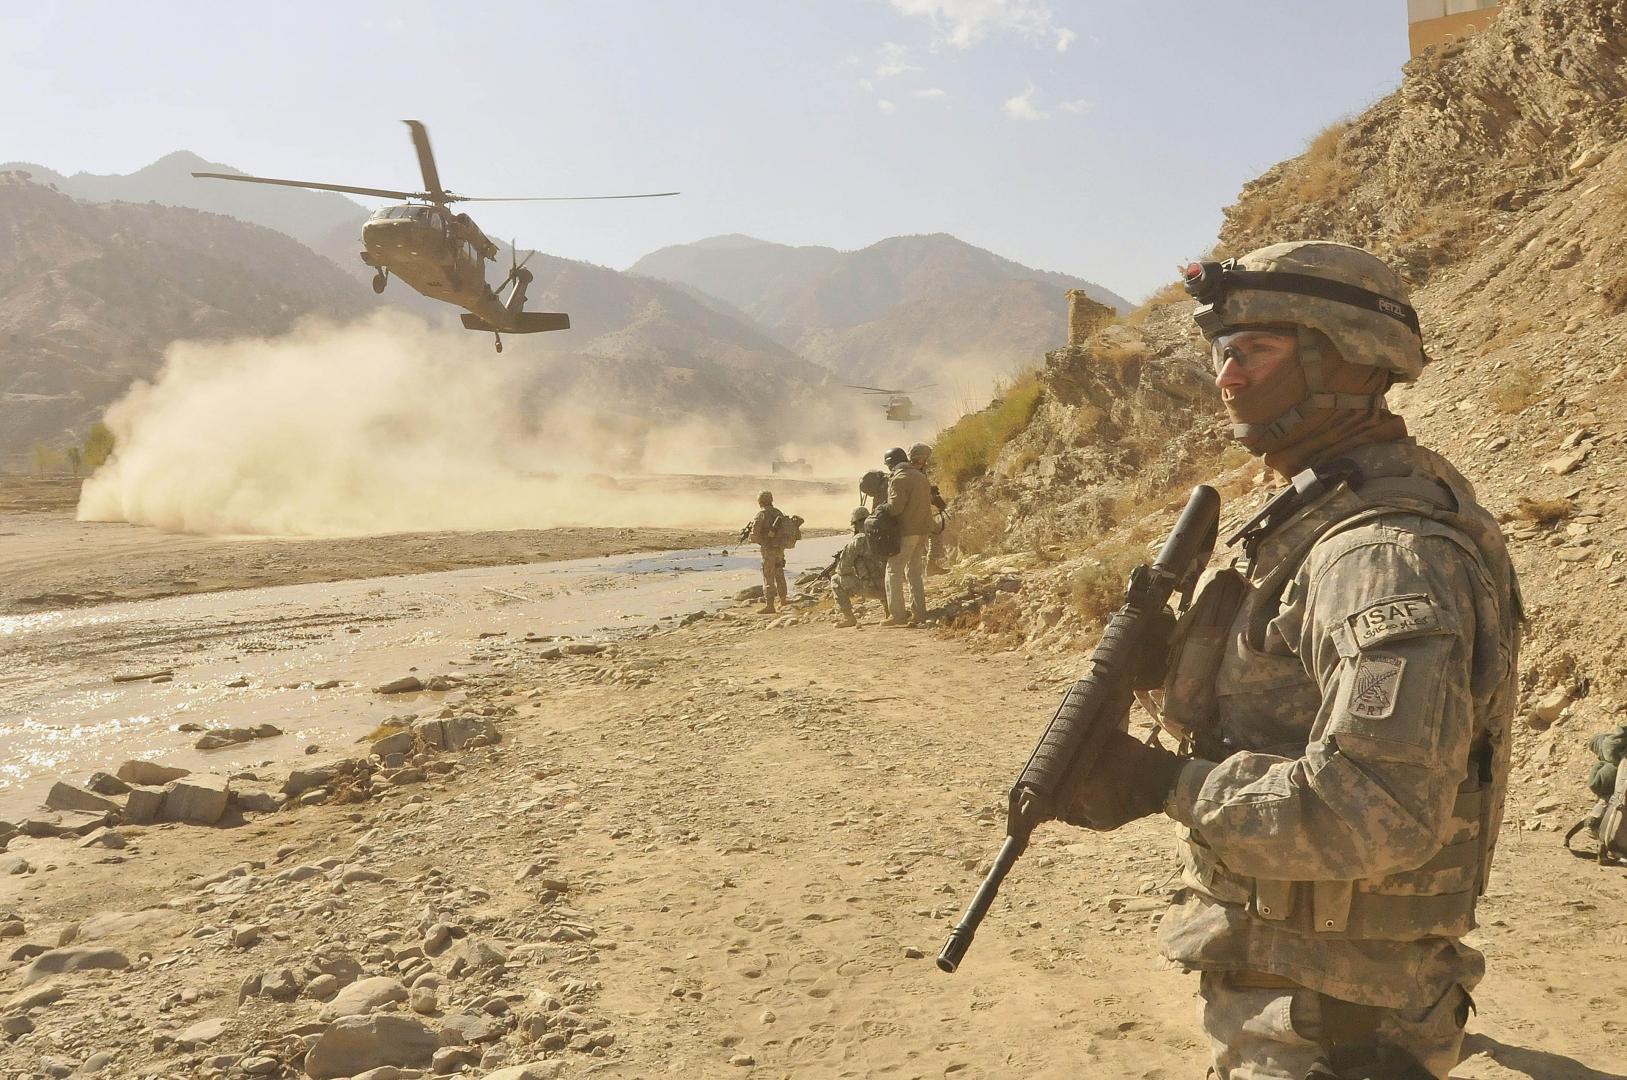 смотреть картинки афганистан